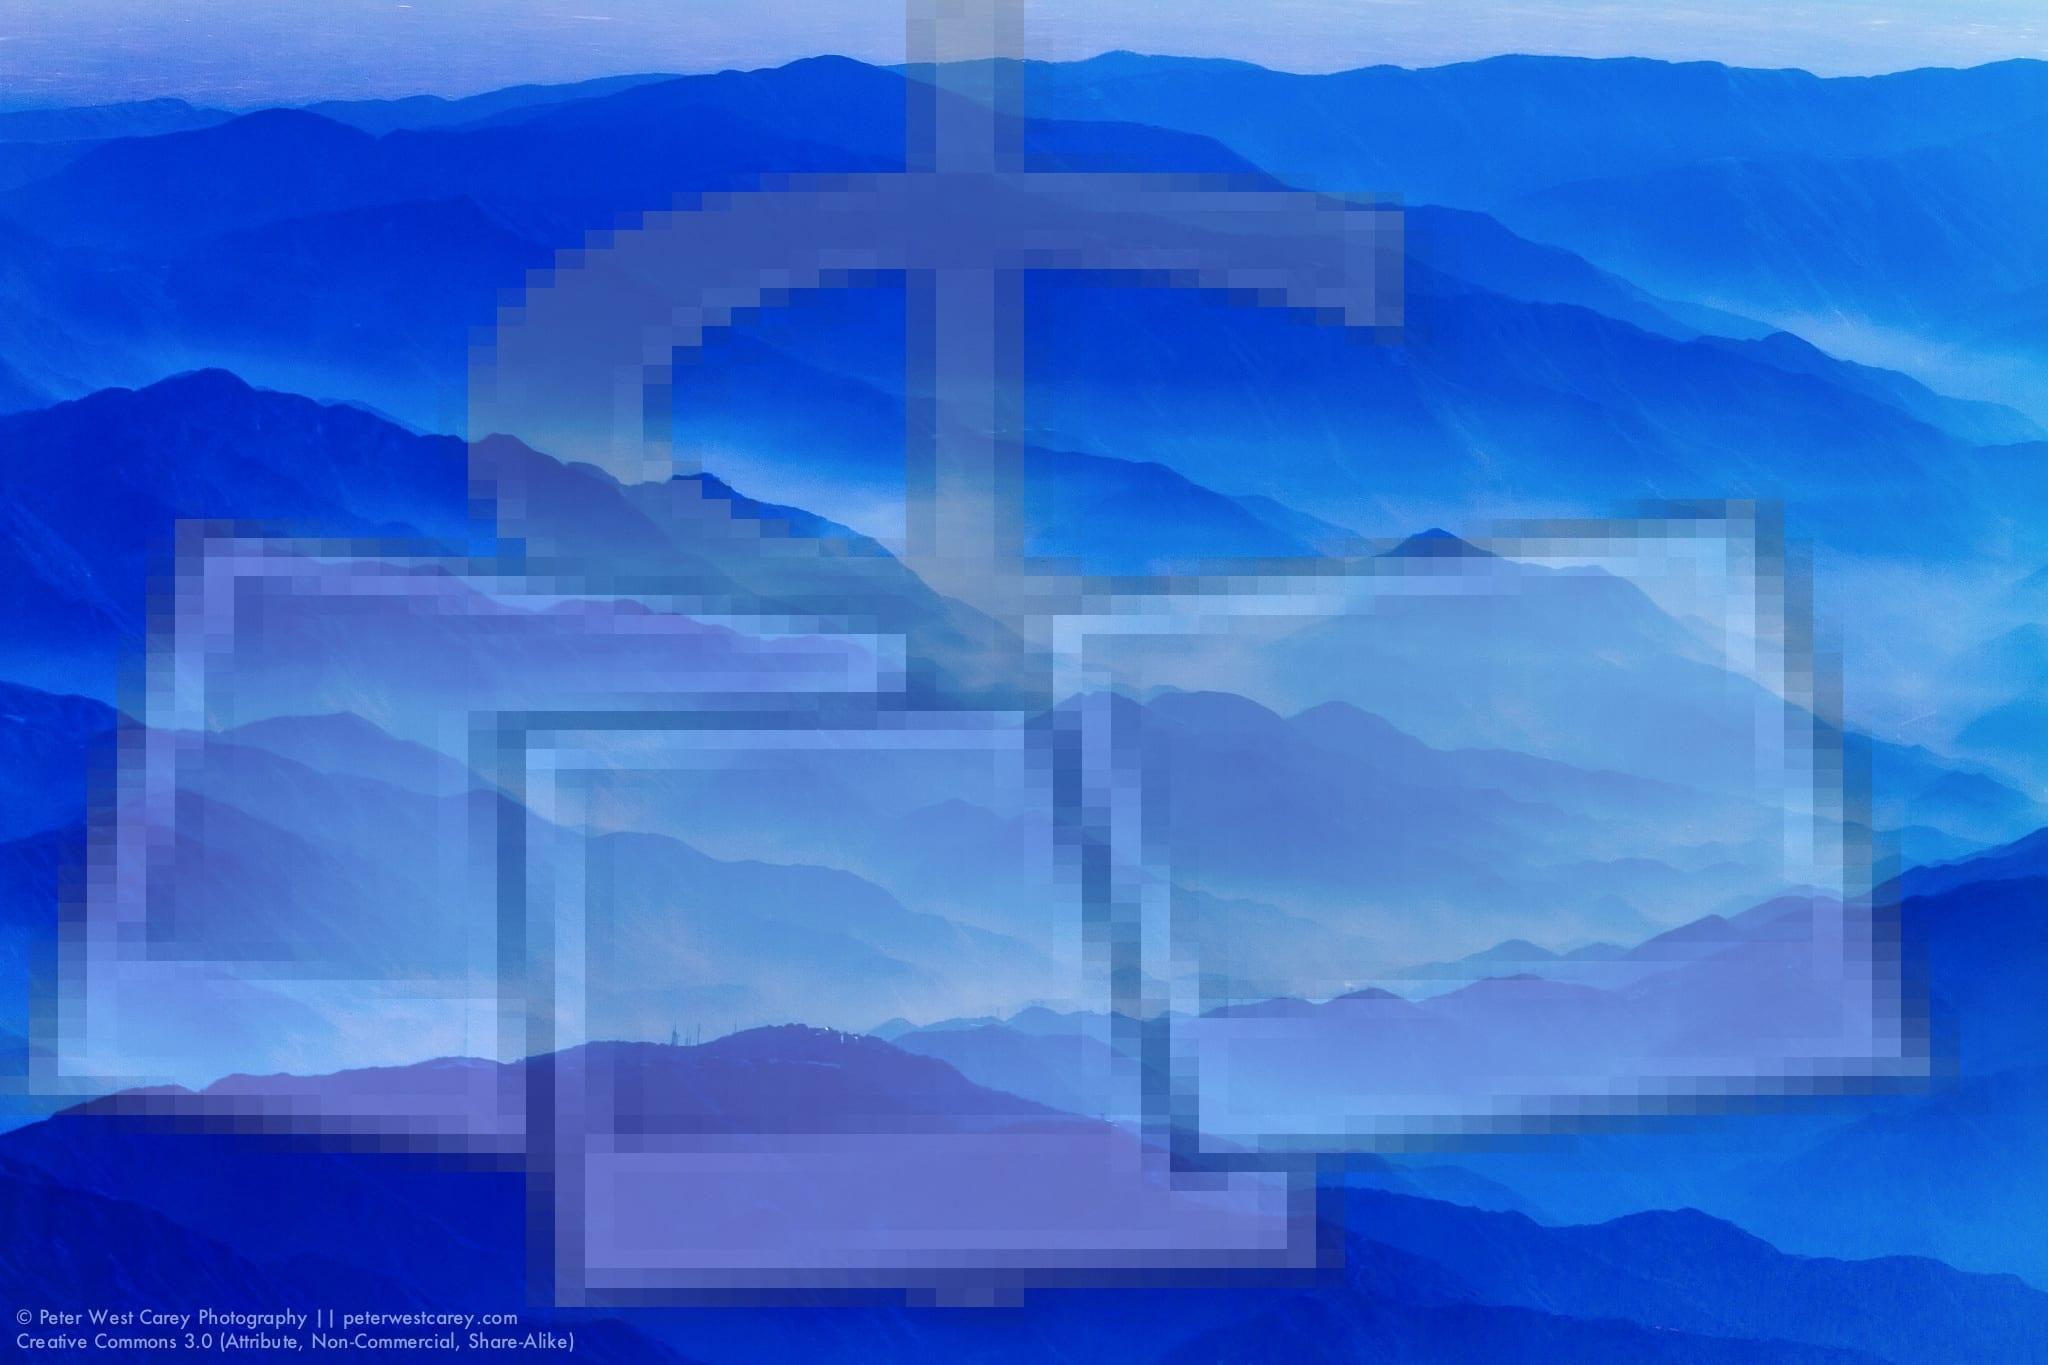 Peter-West-Carey-California2014-0818-3472-3